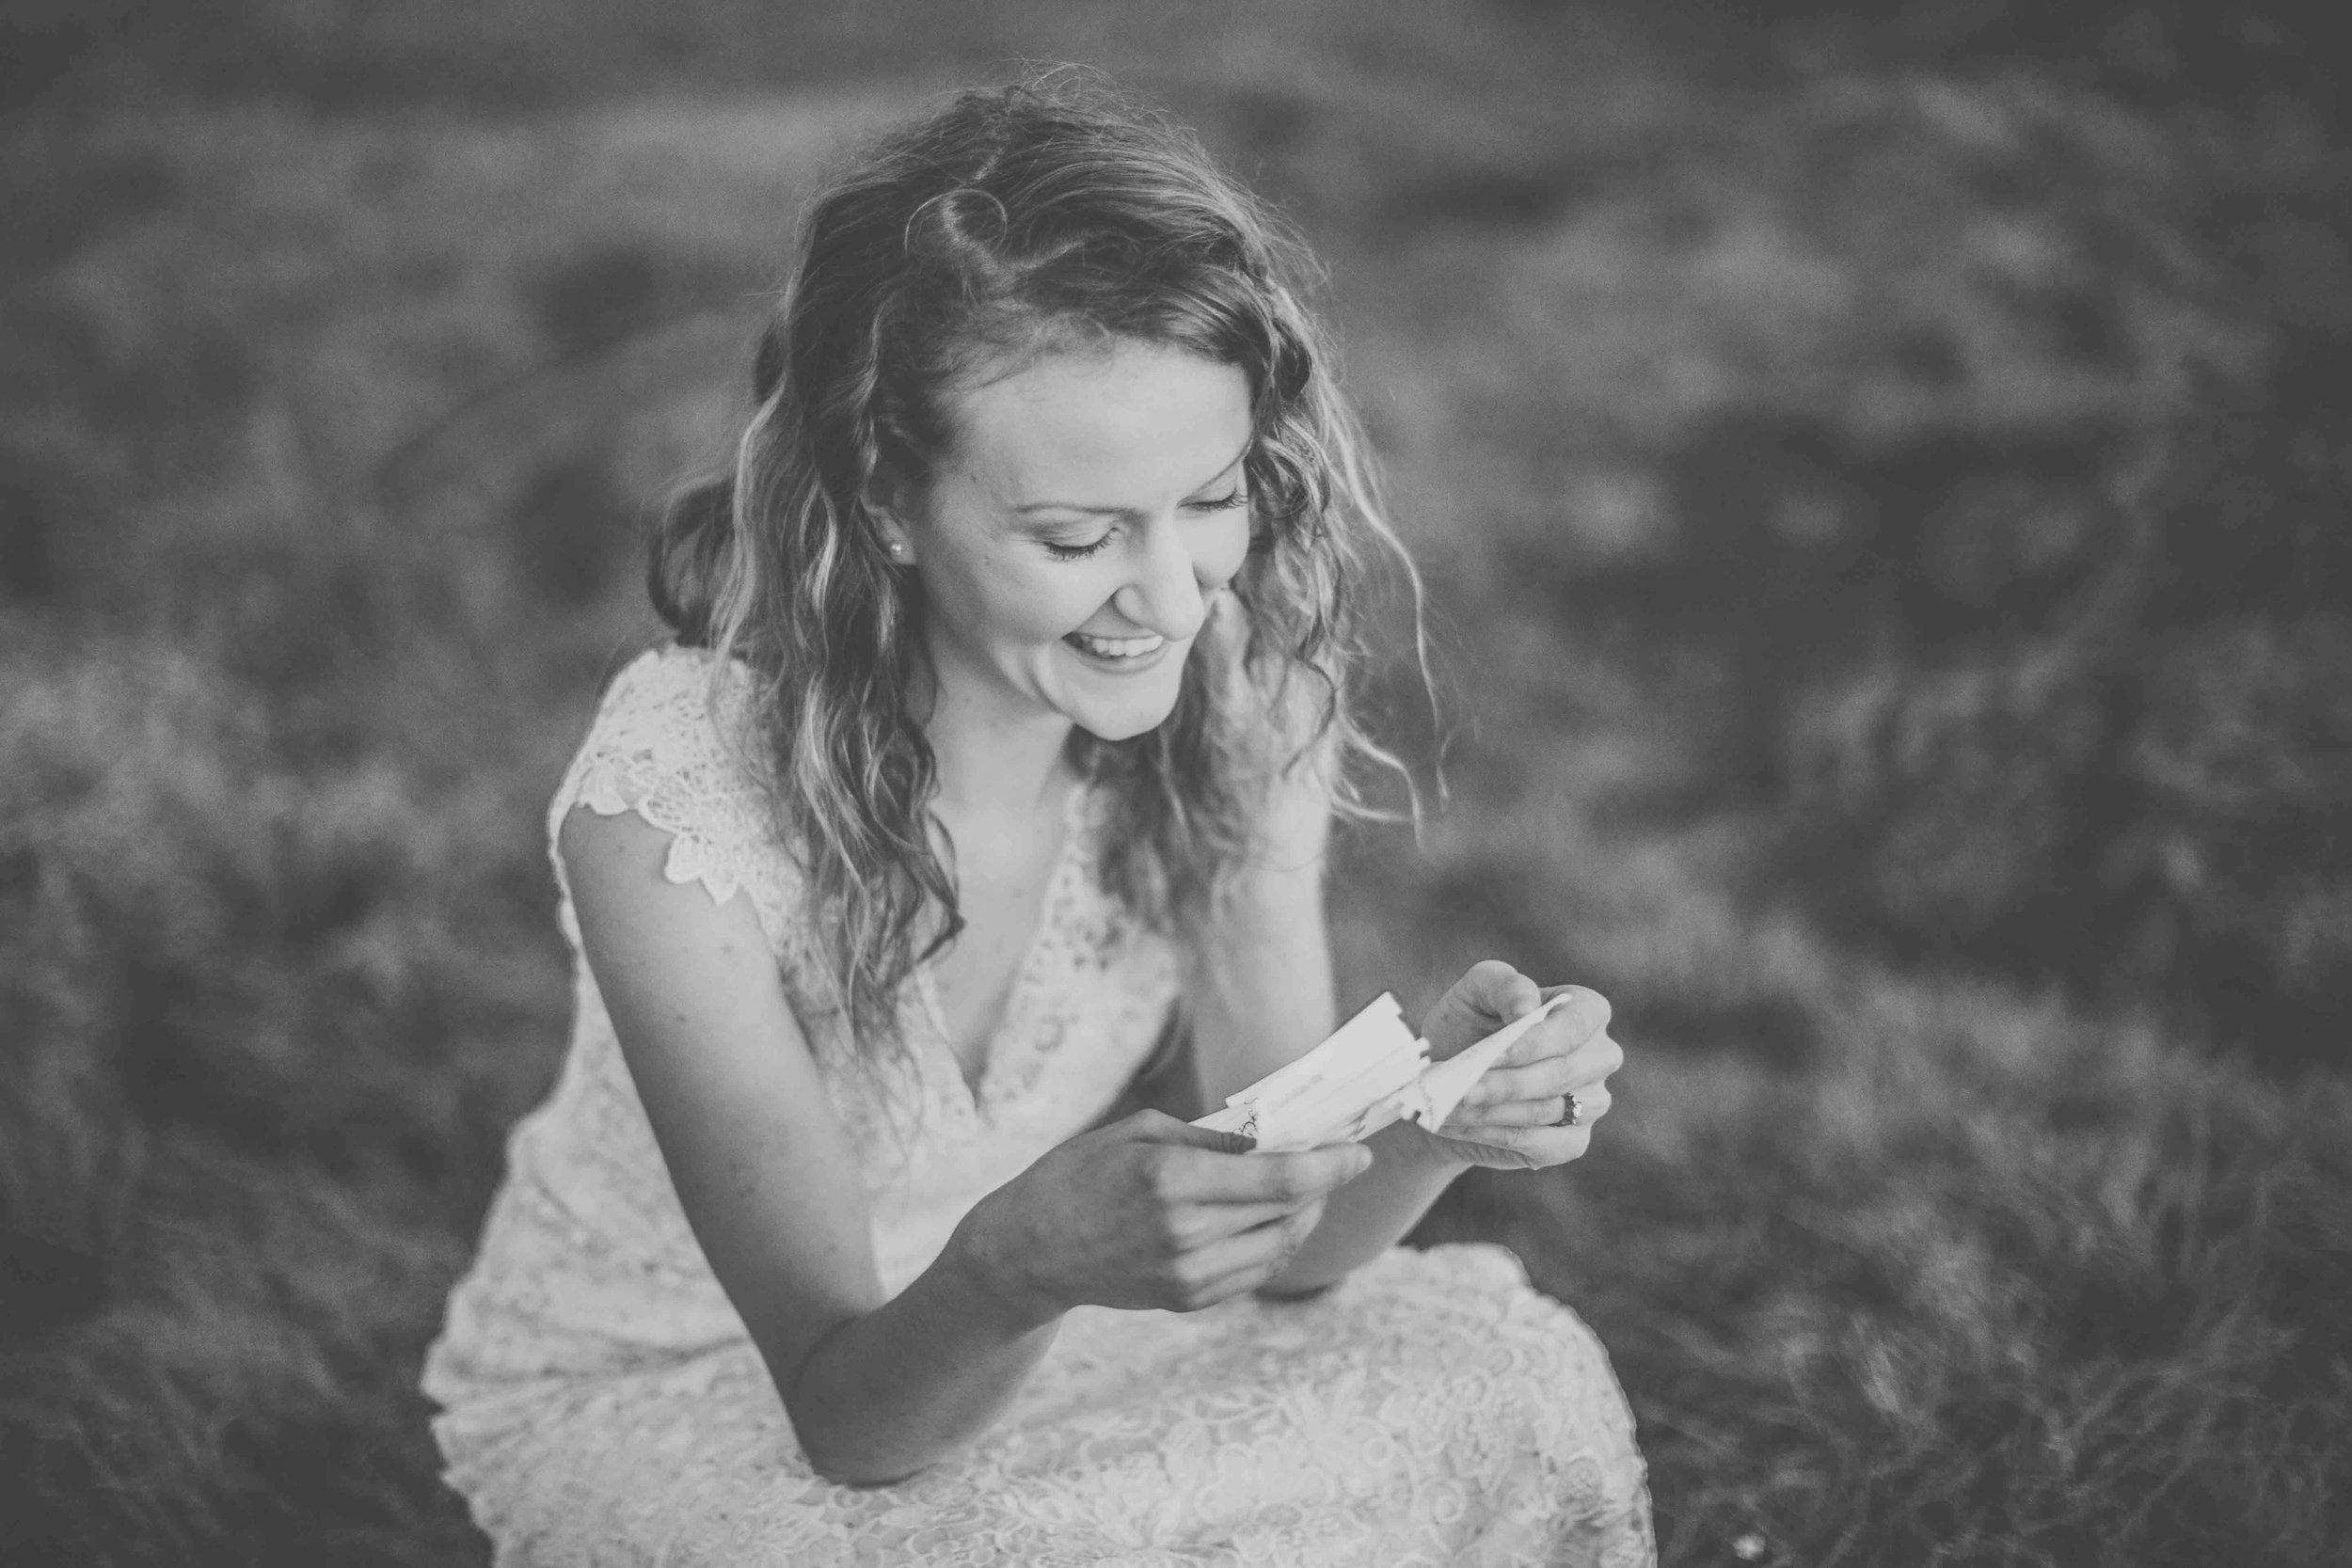 north-carolina-elopement-photographer-6.jpg